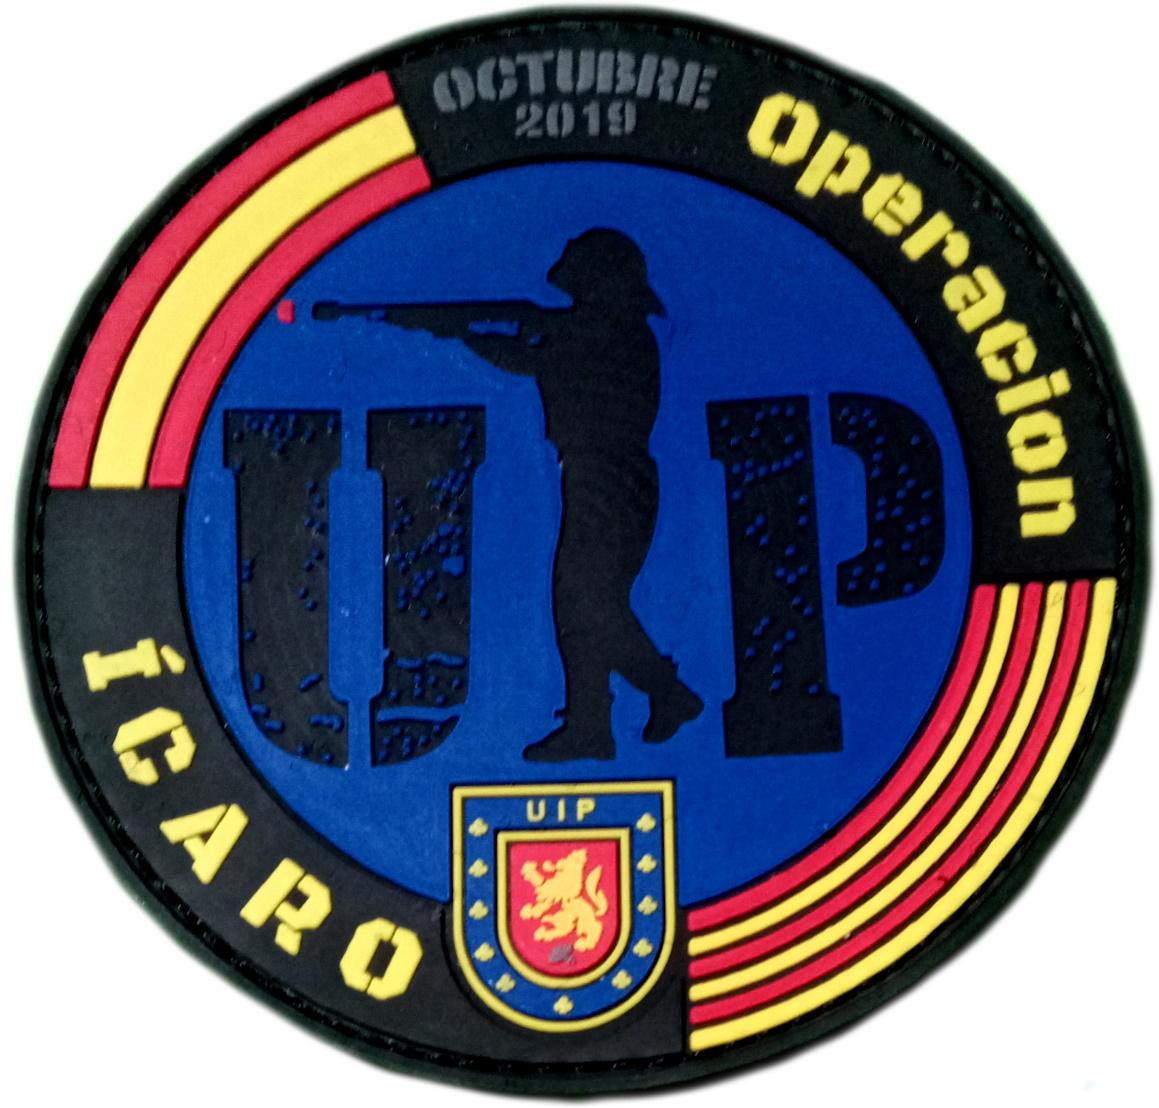 POLICÍA NACIONAL CNP UIP OPERACIÓN ÍCARO OCTUBRE 2019 PARCHE INSIGNIA EMBLEMA DISTINTIVO